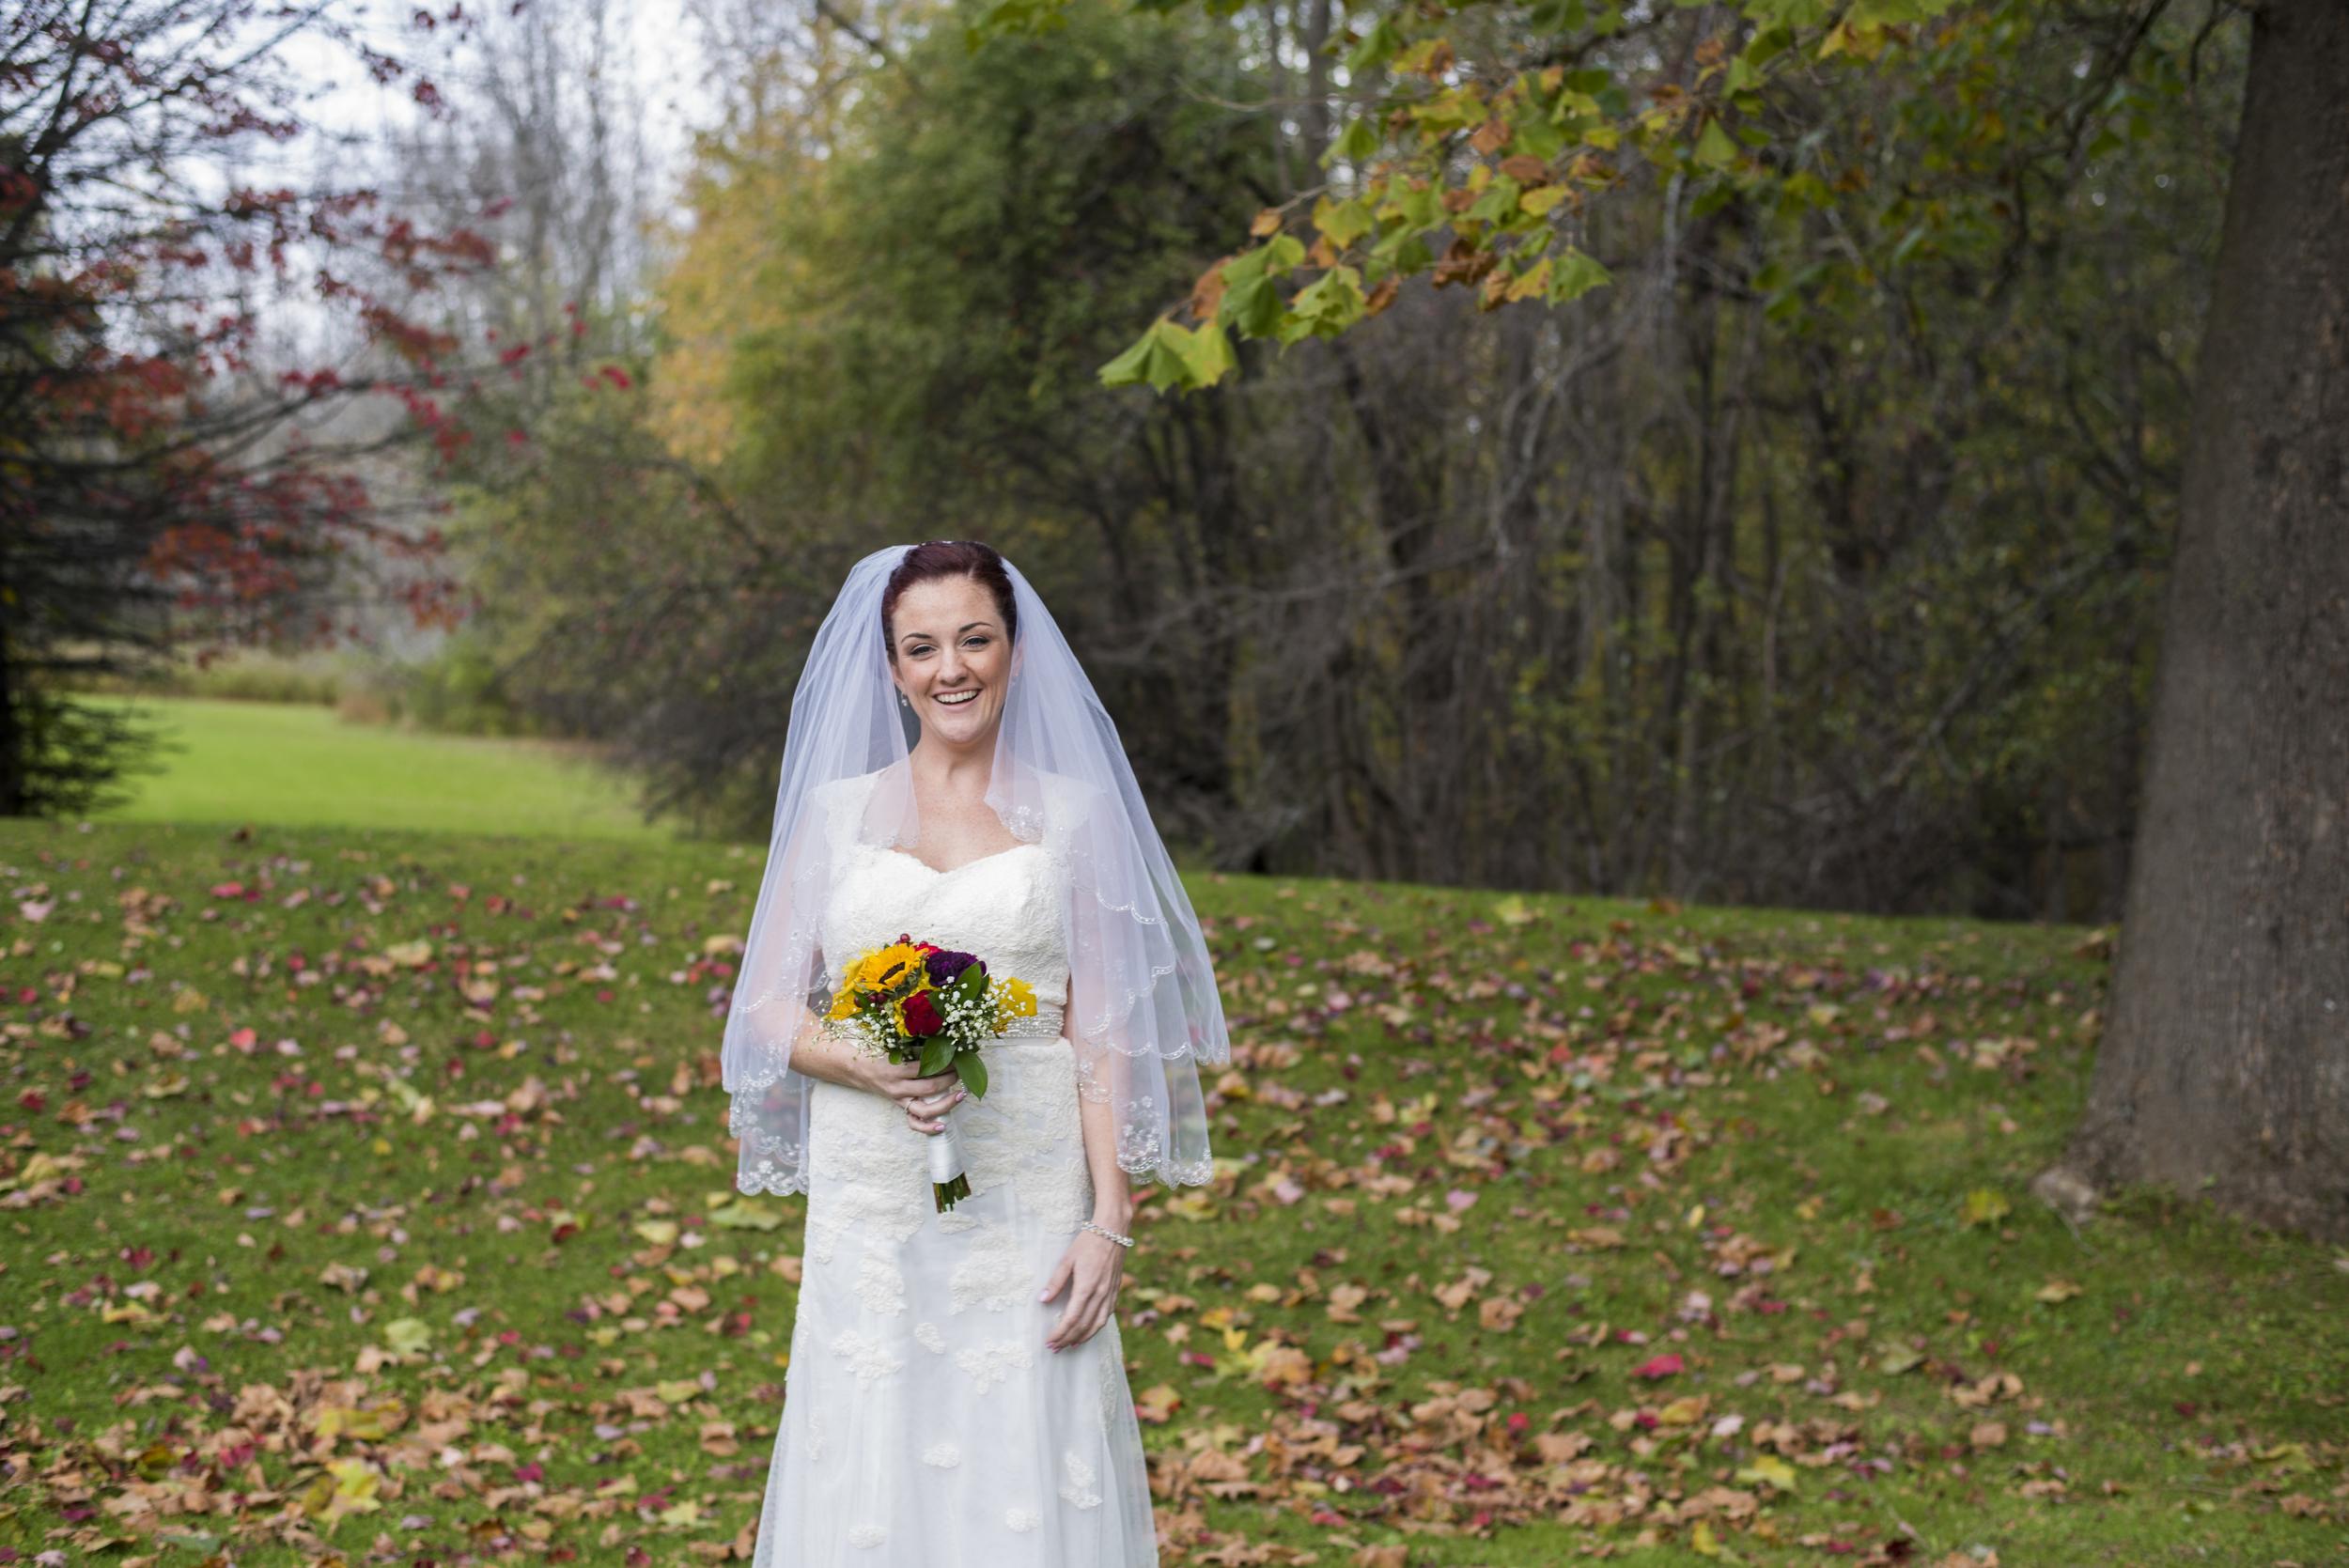 ShannonMike_Print_WeddingParty-3.jpg